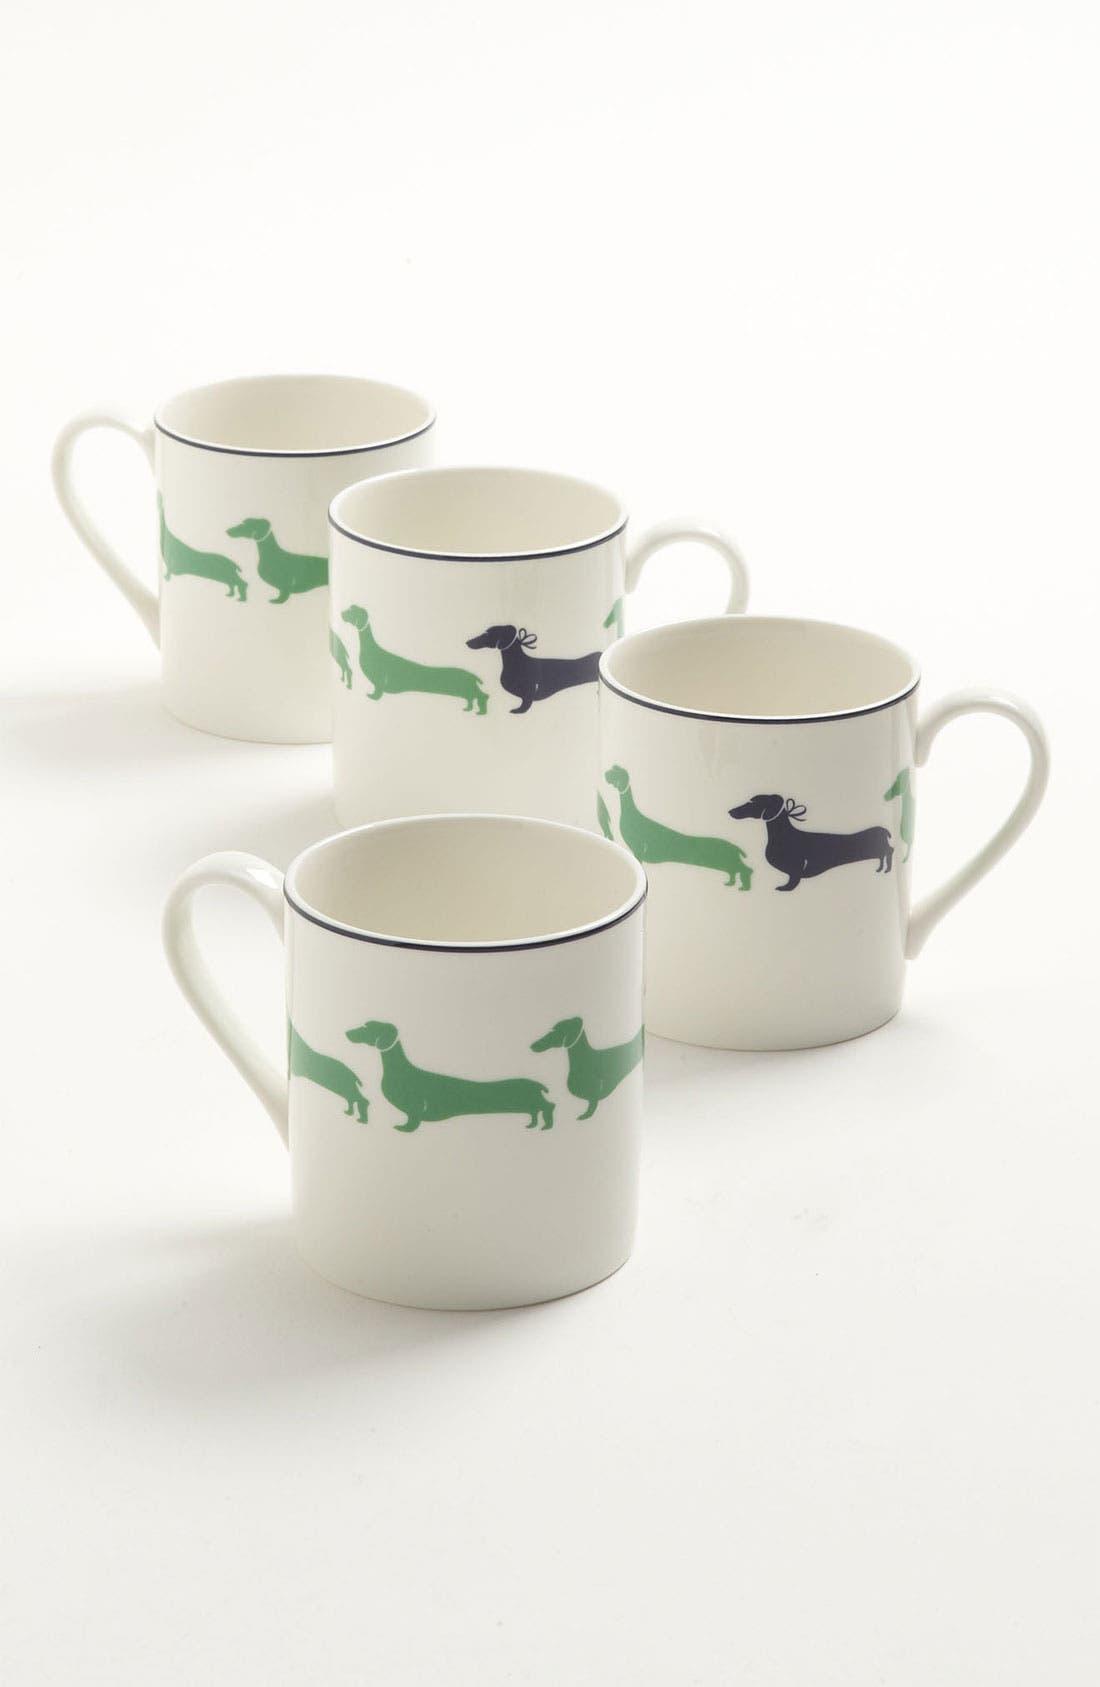 'wickford - dachshund' mug,                             Alternate thumbnail 2, color,                             100